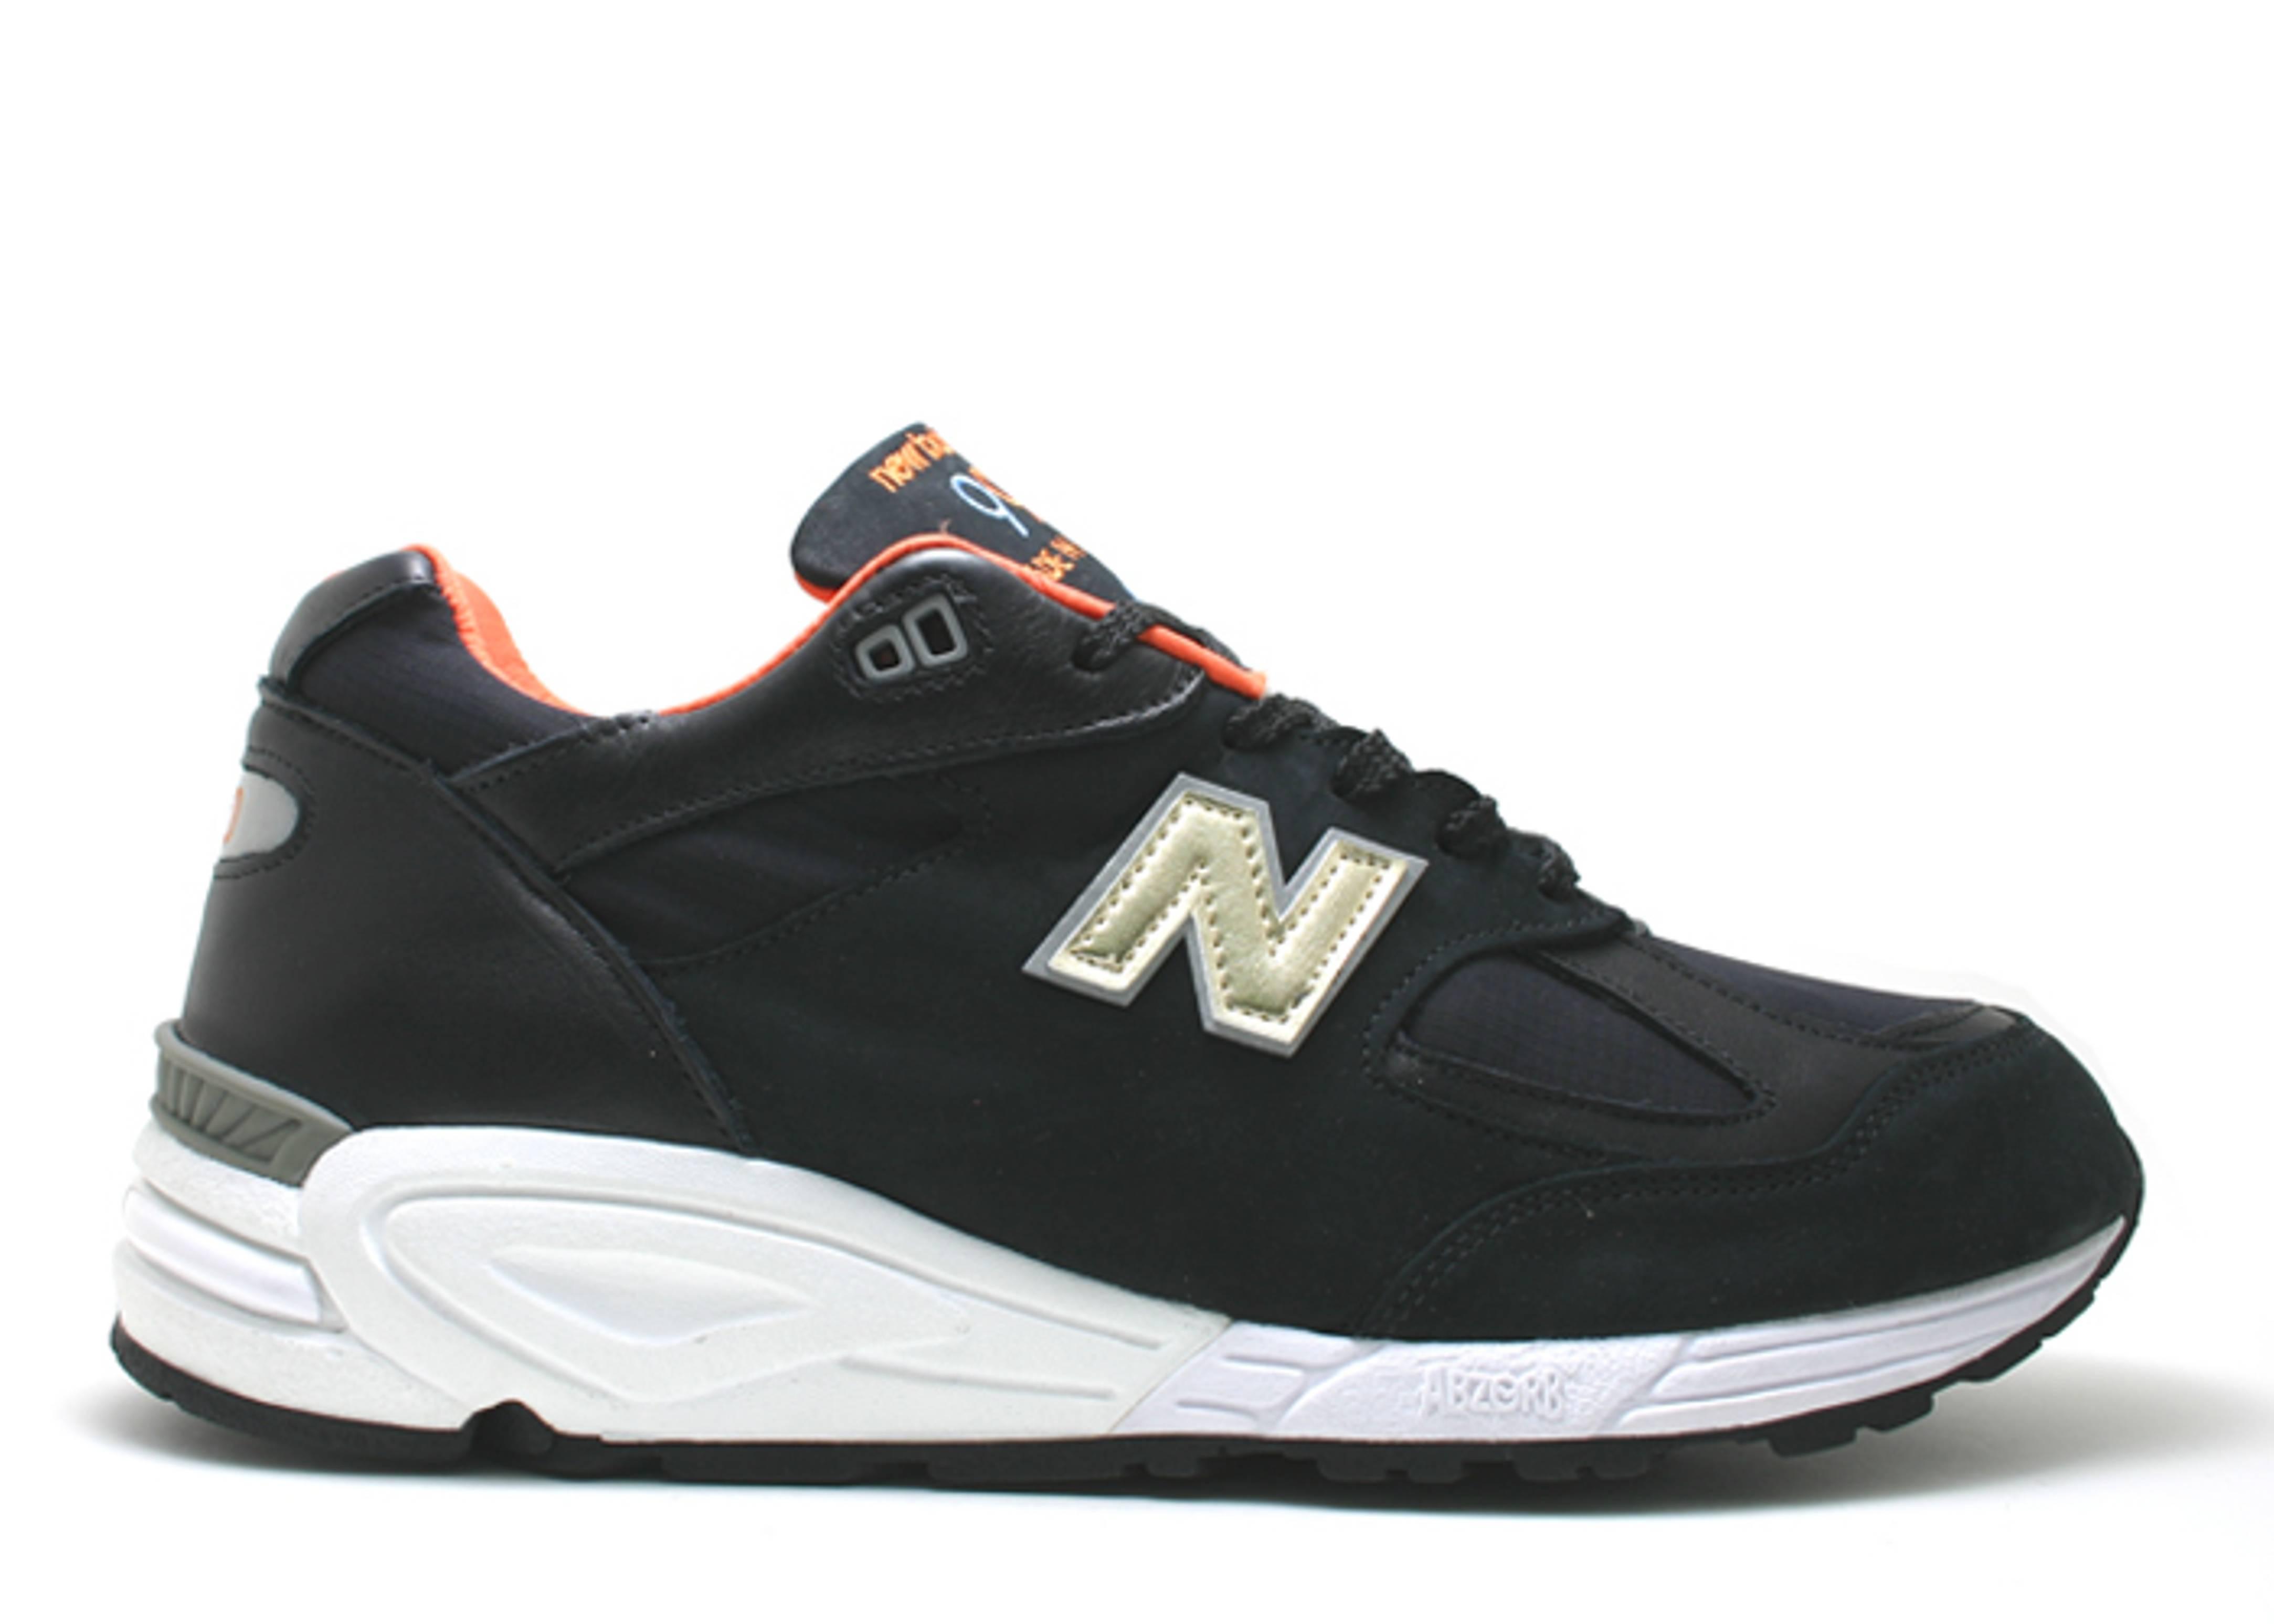 jaula no relacionado maximizar  M990Hsn 'Hanon Shop' - New Balance - M990HSN - black/orange   Flight Club